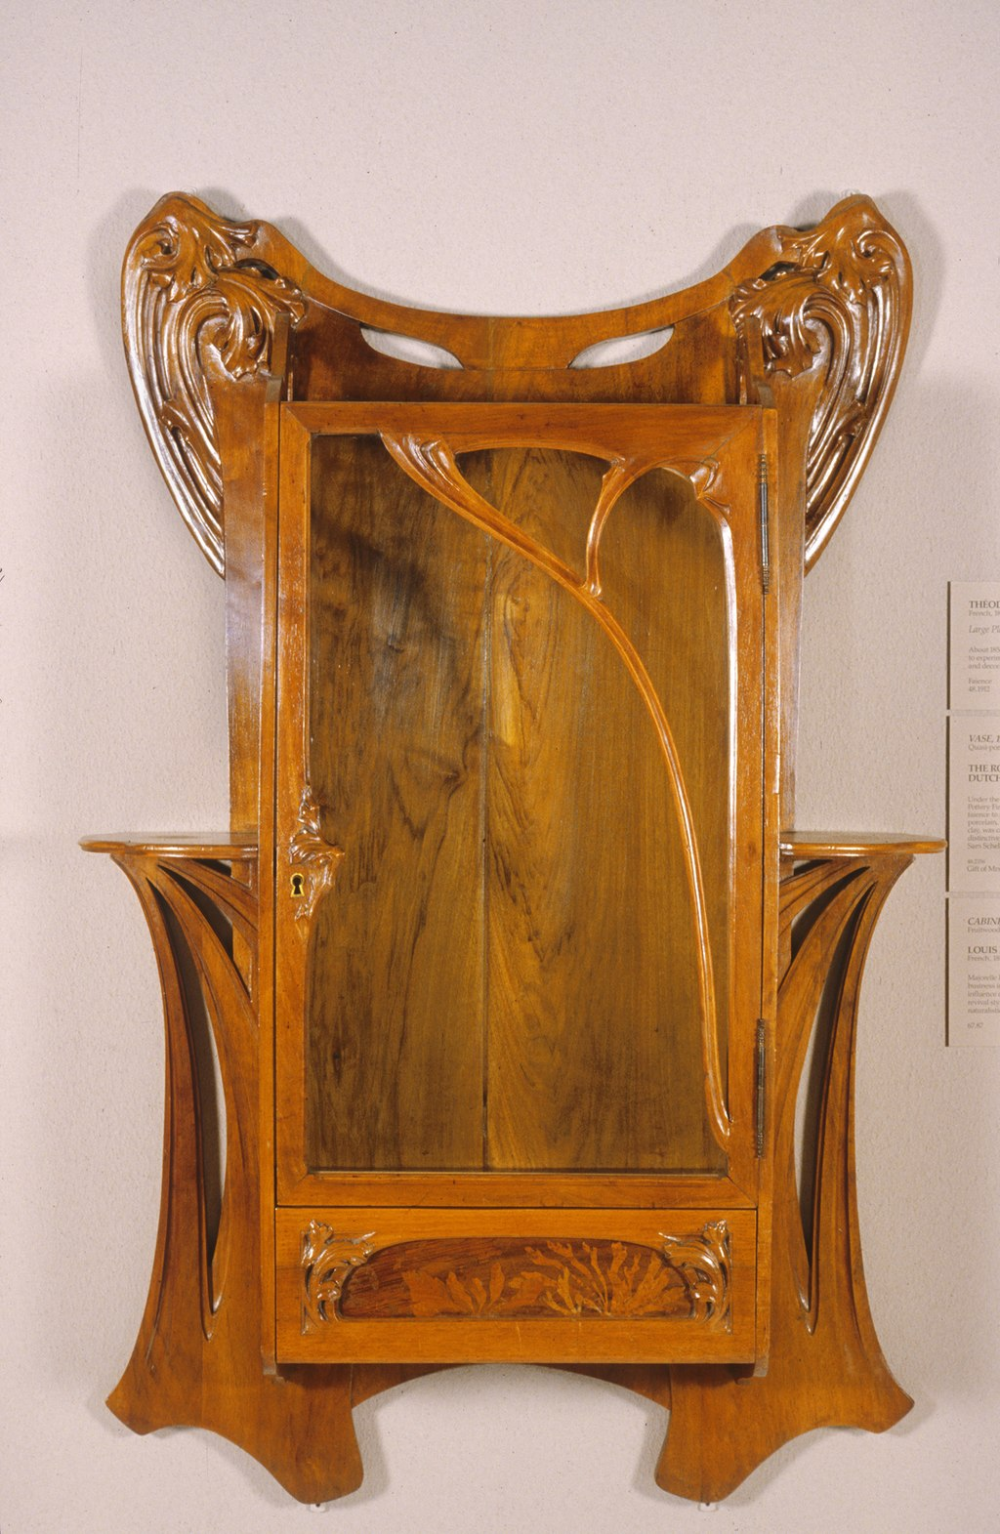 Louis Majorelle Wall Cabinet Walters 6587 Art Nouveau Wikipedia In 2020 Art Nouveau Furniture Art Nouveau Interior Art Nouveau Cabinet